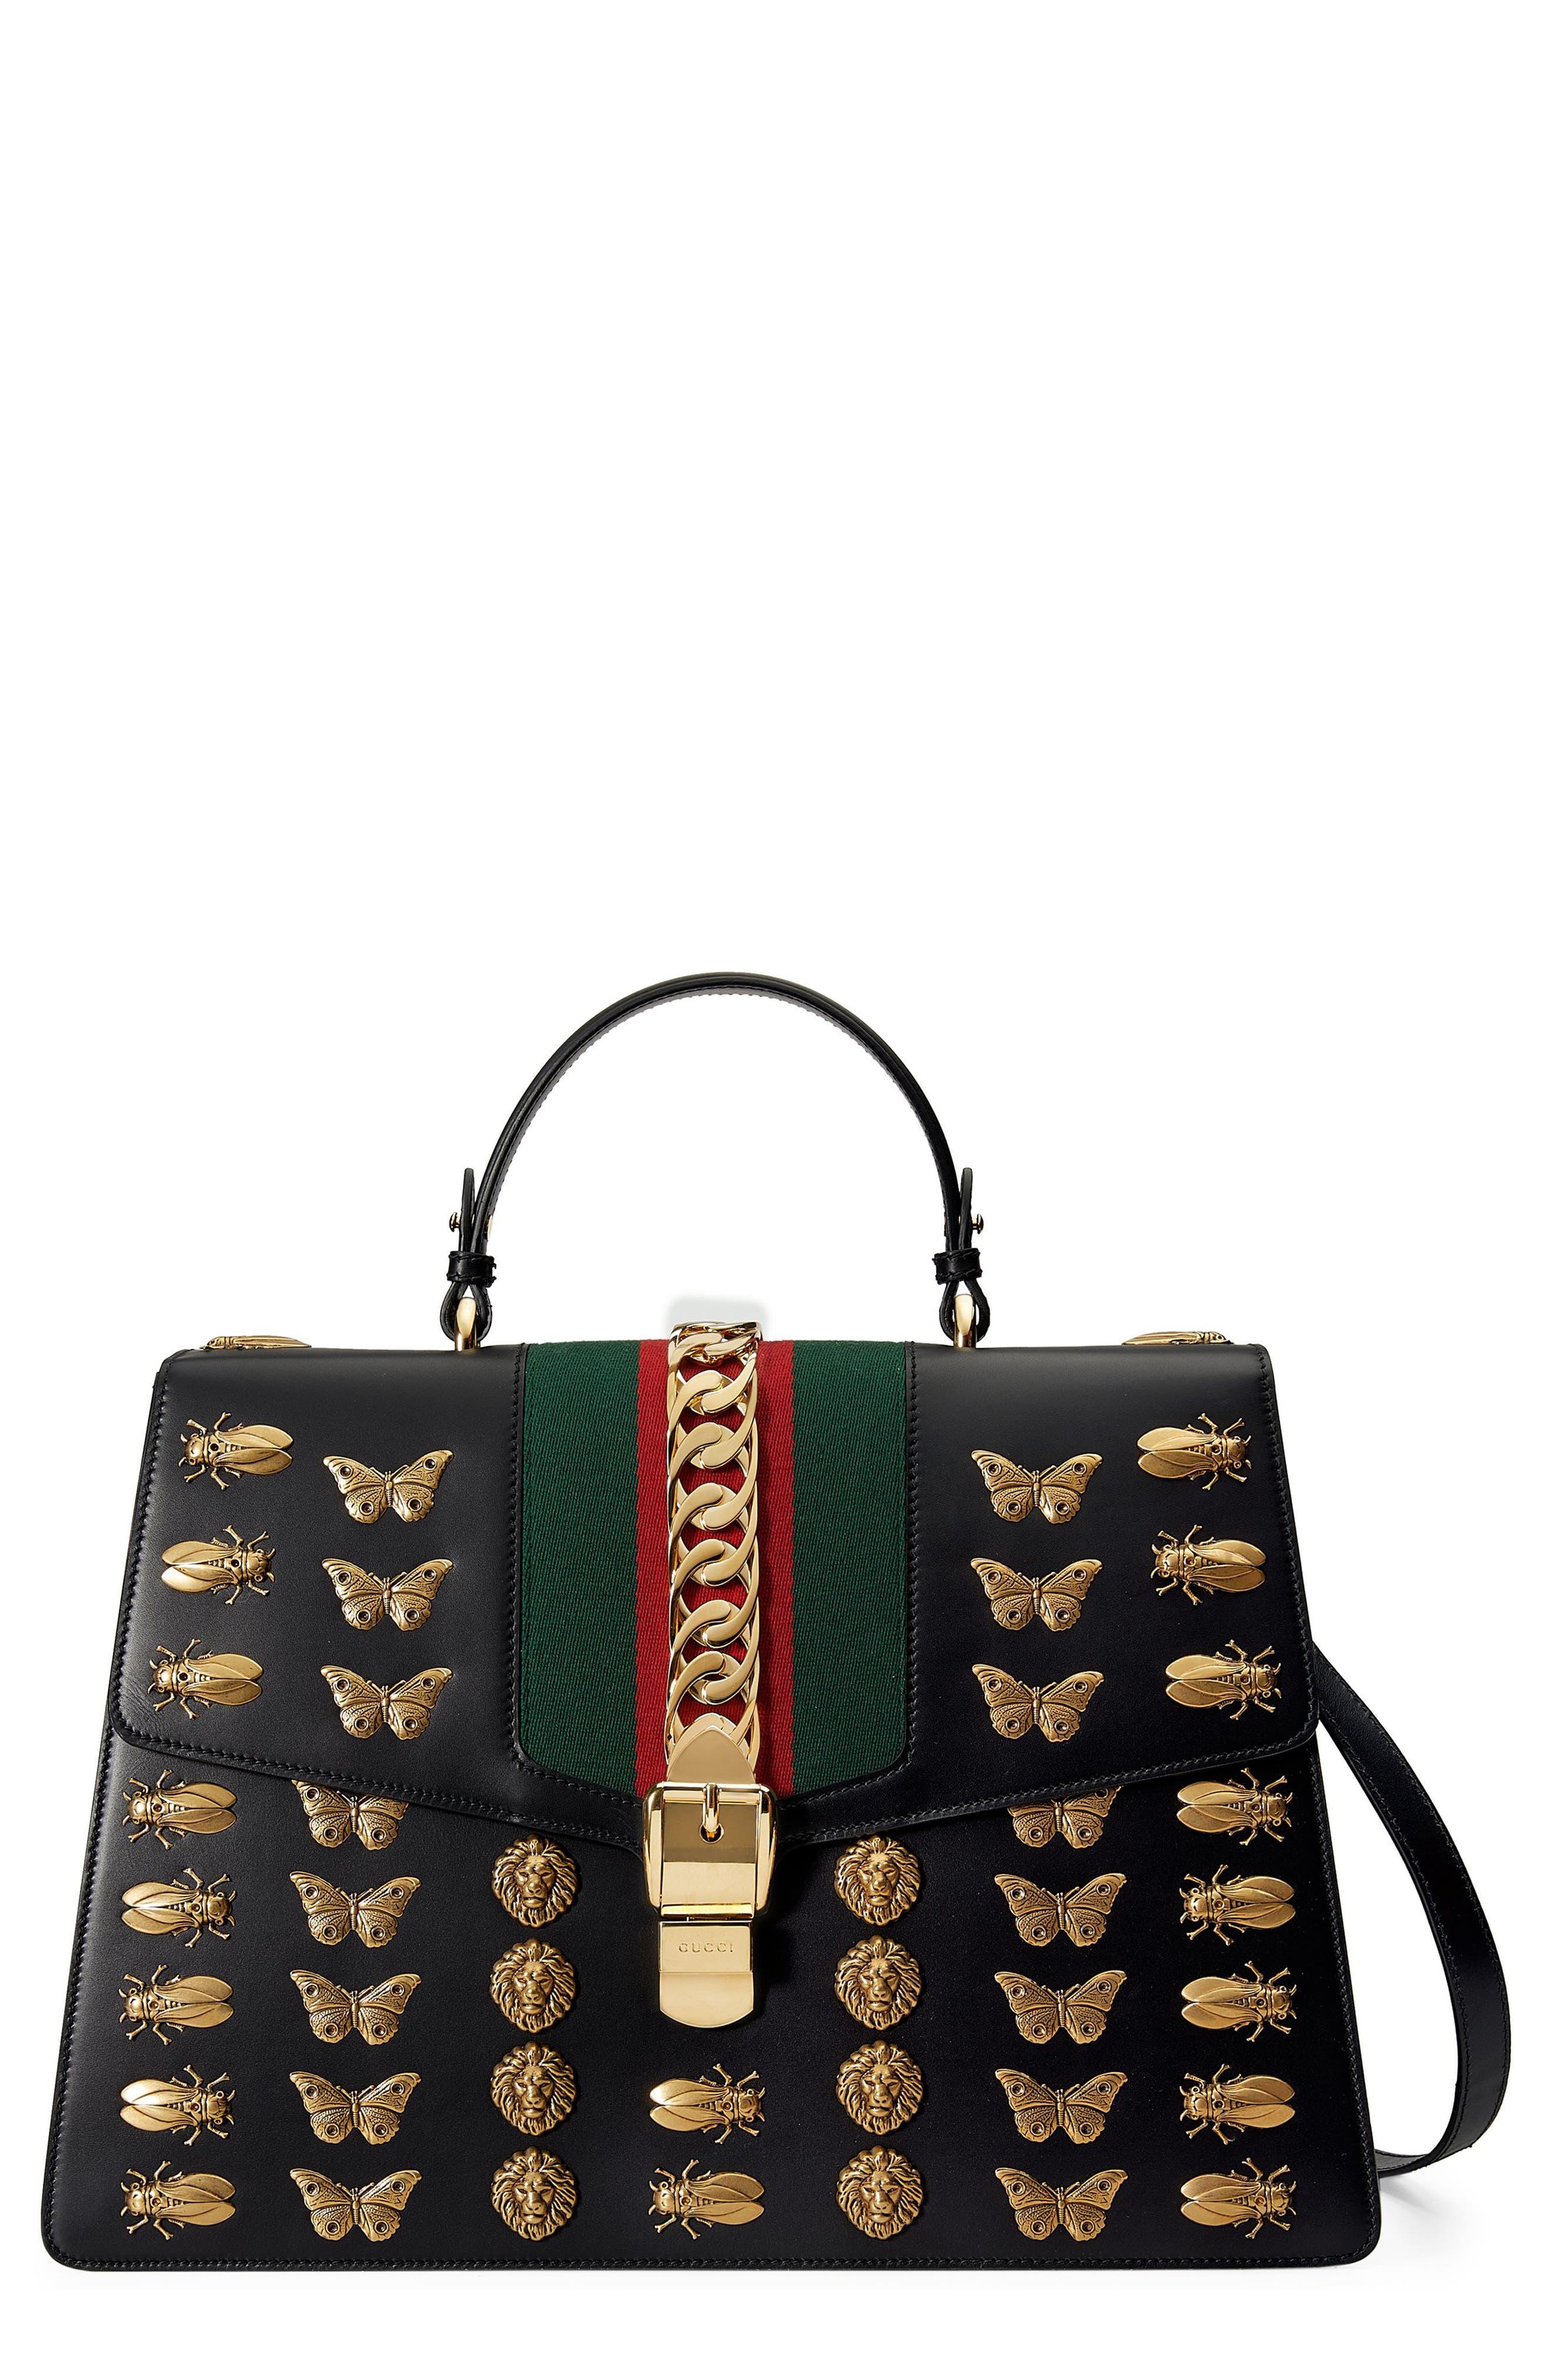 Gucci Maxi Sylvie Animal Stud Leather Shoulder Bag